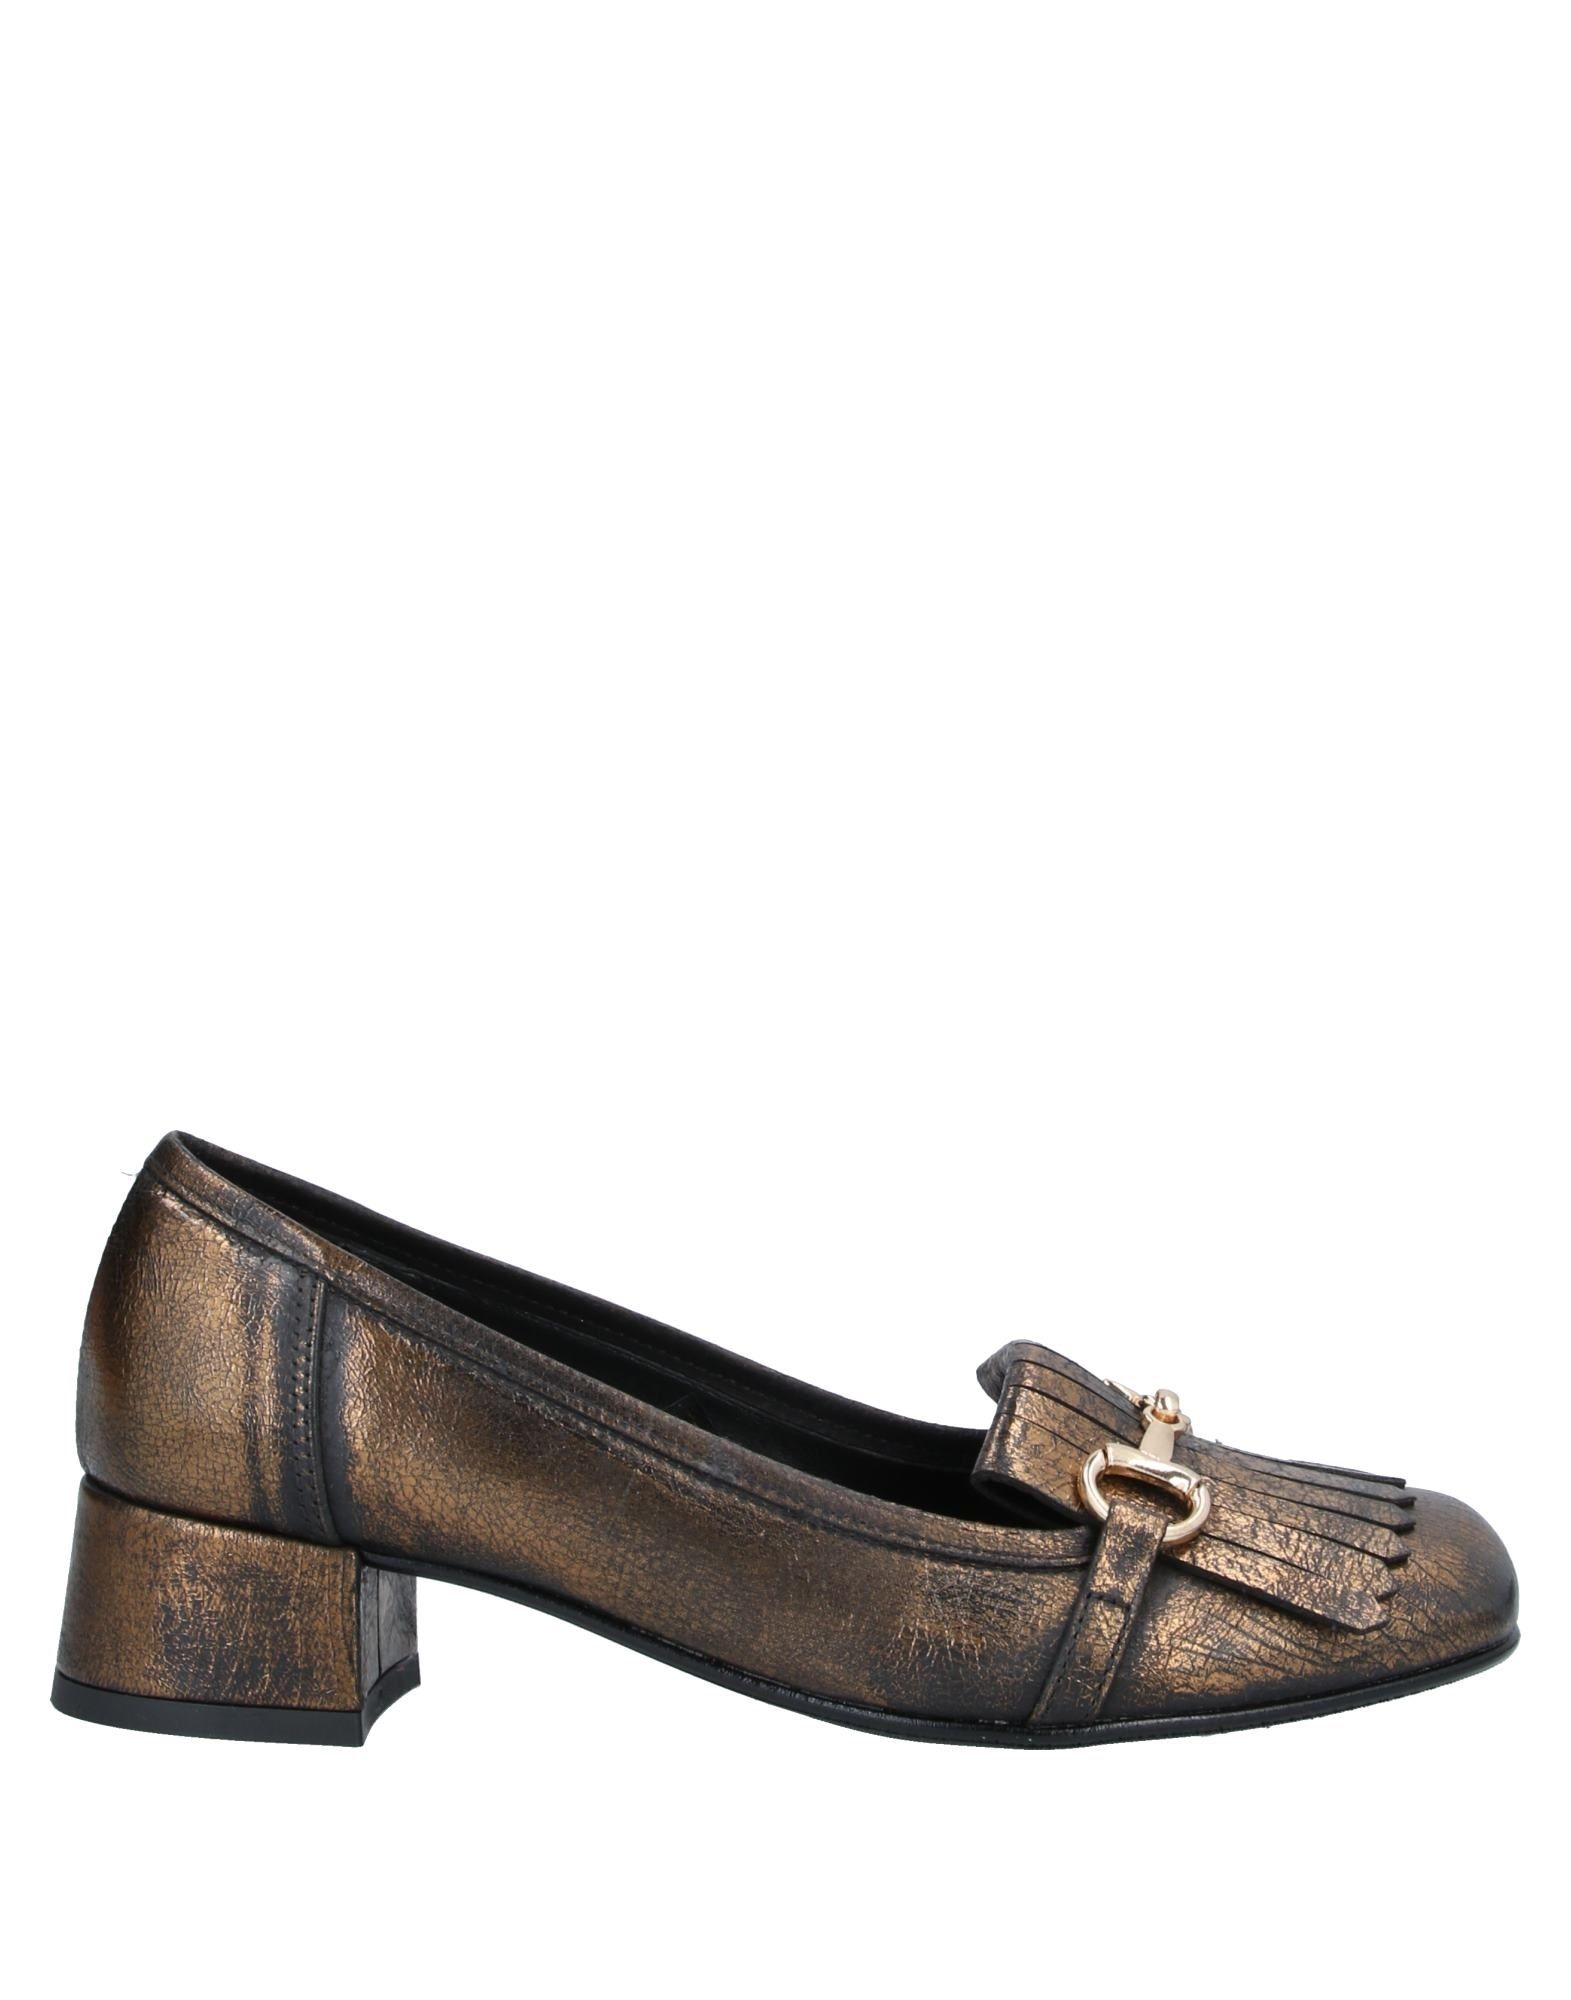 NILA & NILA Мокасины ankle boots nila nila ботильоны на шнуровке